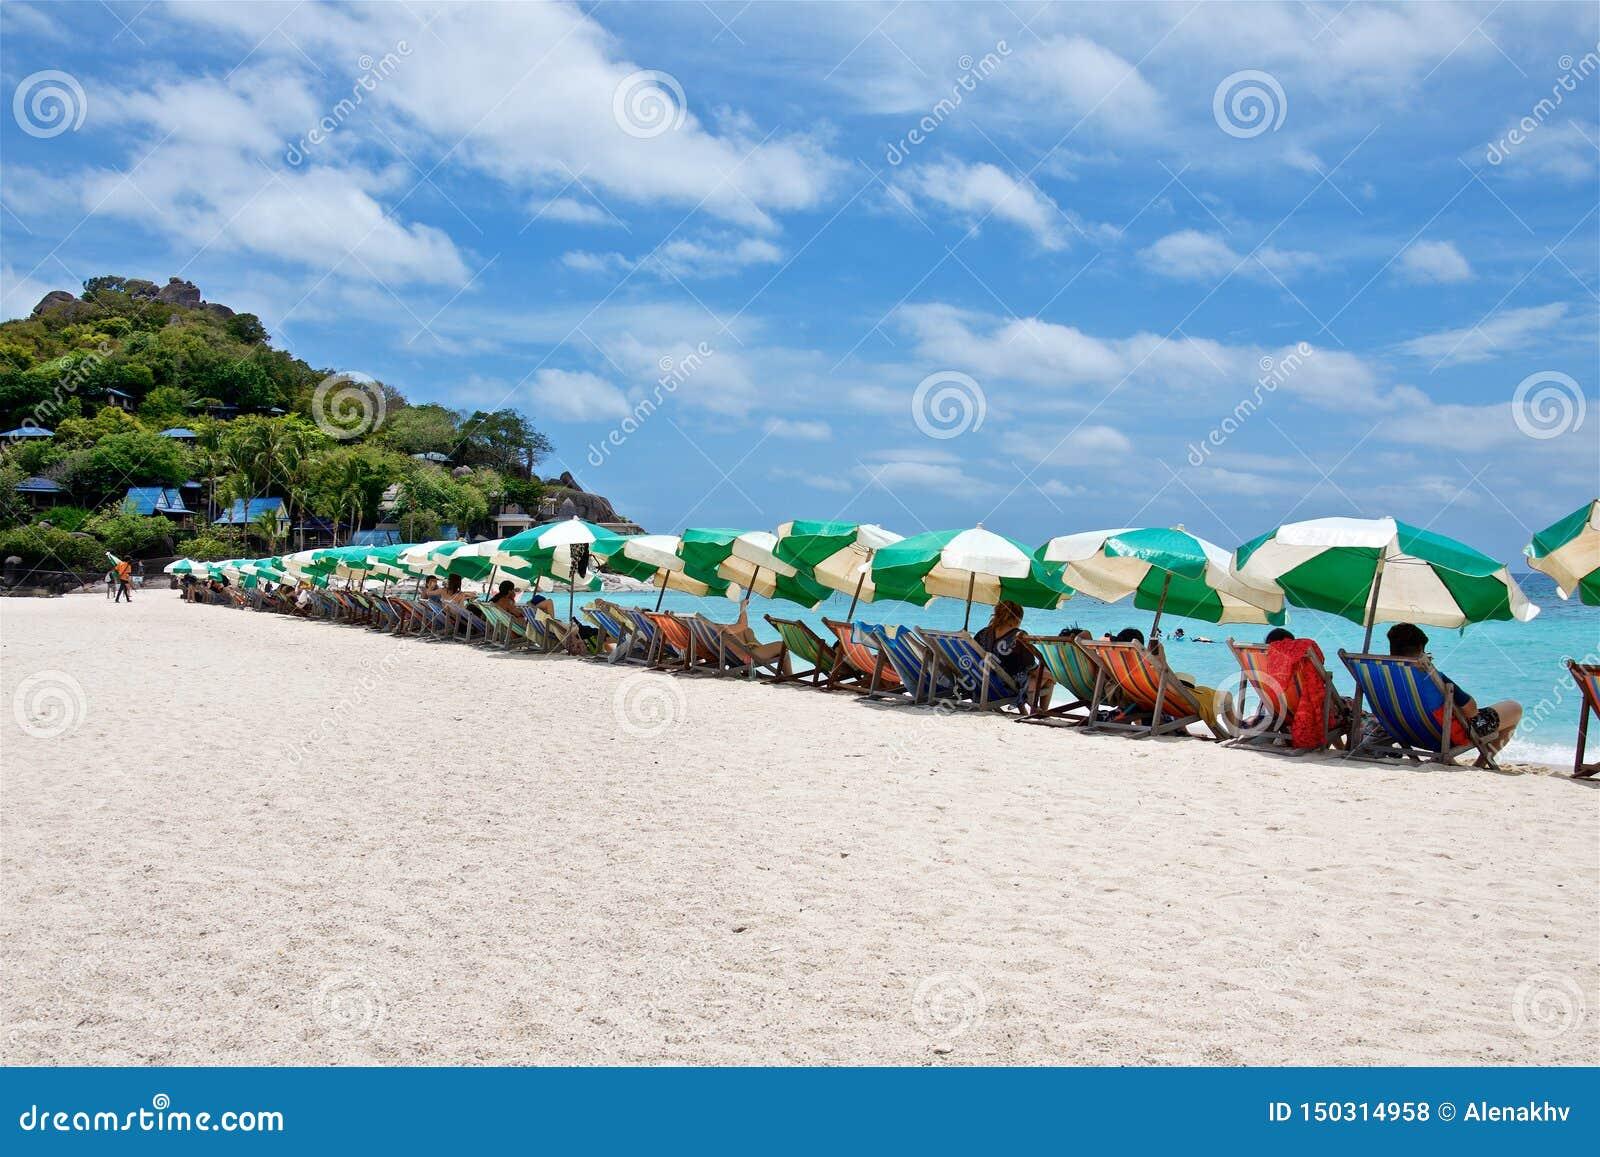 Sun umbrellas and deck chairs on a white beach of Nang Yuan island